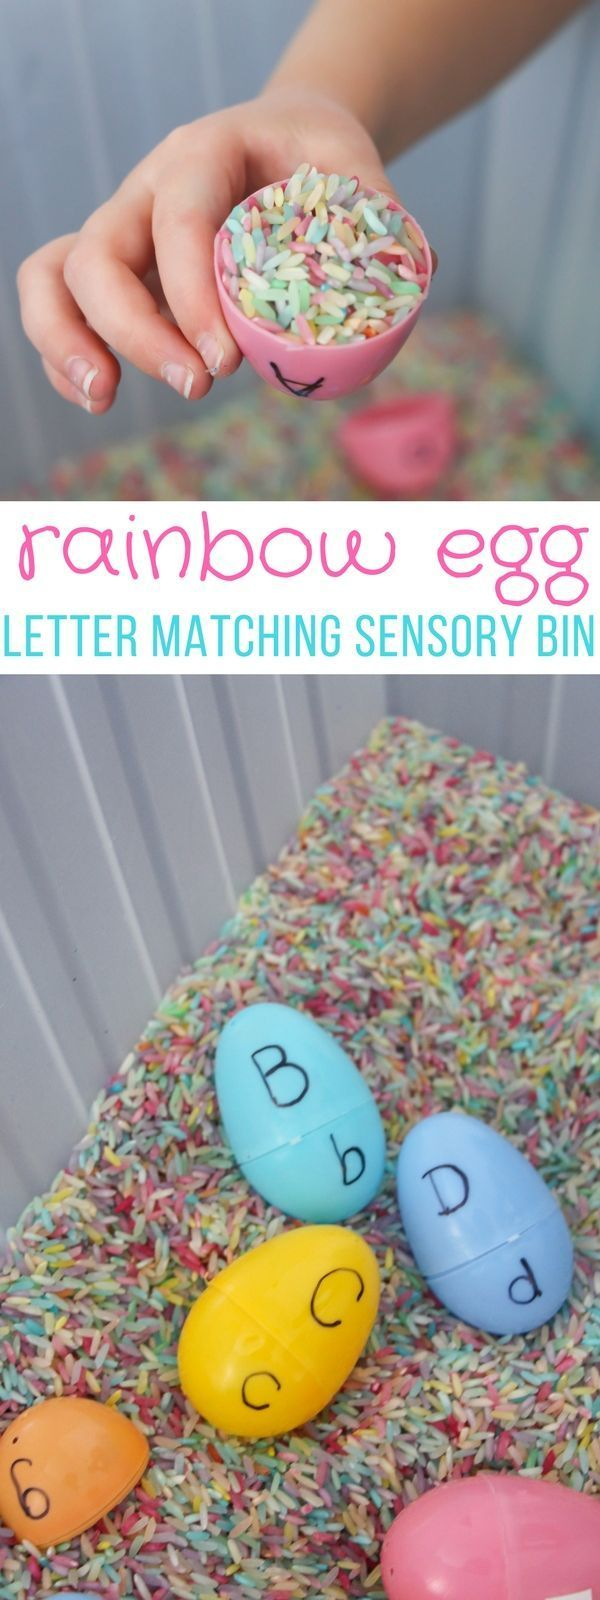 Easy literacy building sensory bins like this Rainbow